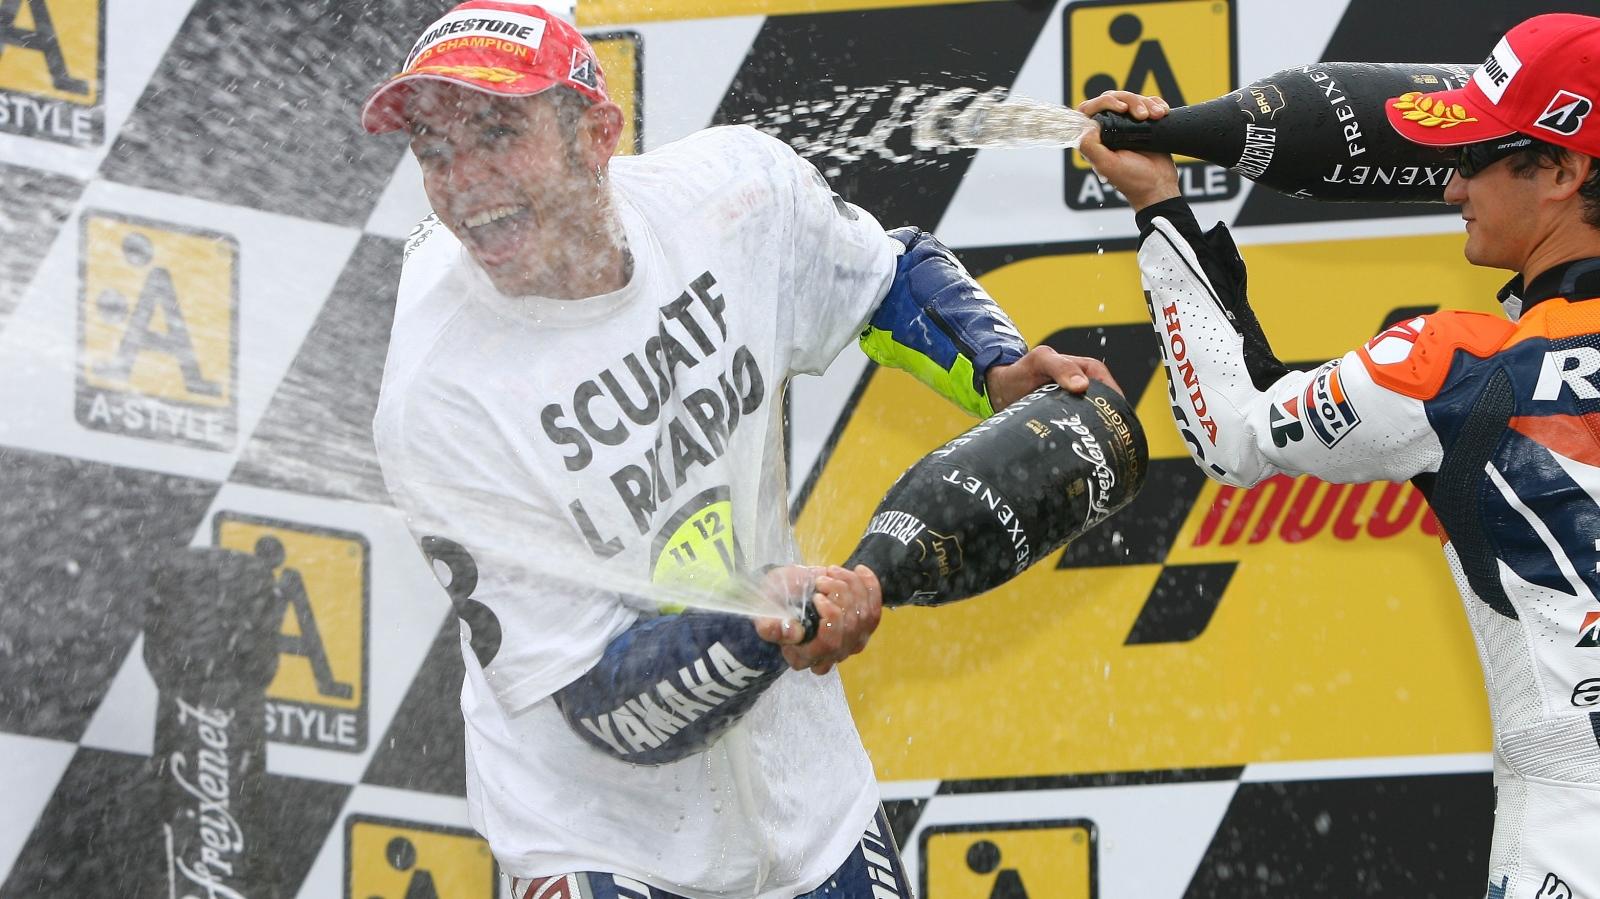 25 años Valentino Rossi: 2008 – Campeón MotoGP – Yamaha YZR-M1 / Fiat Yamaha Team